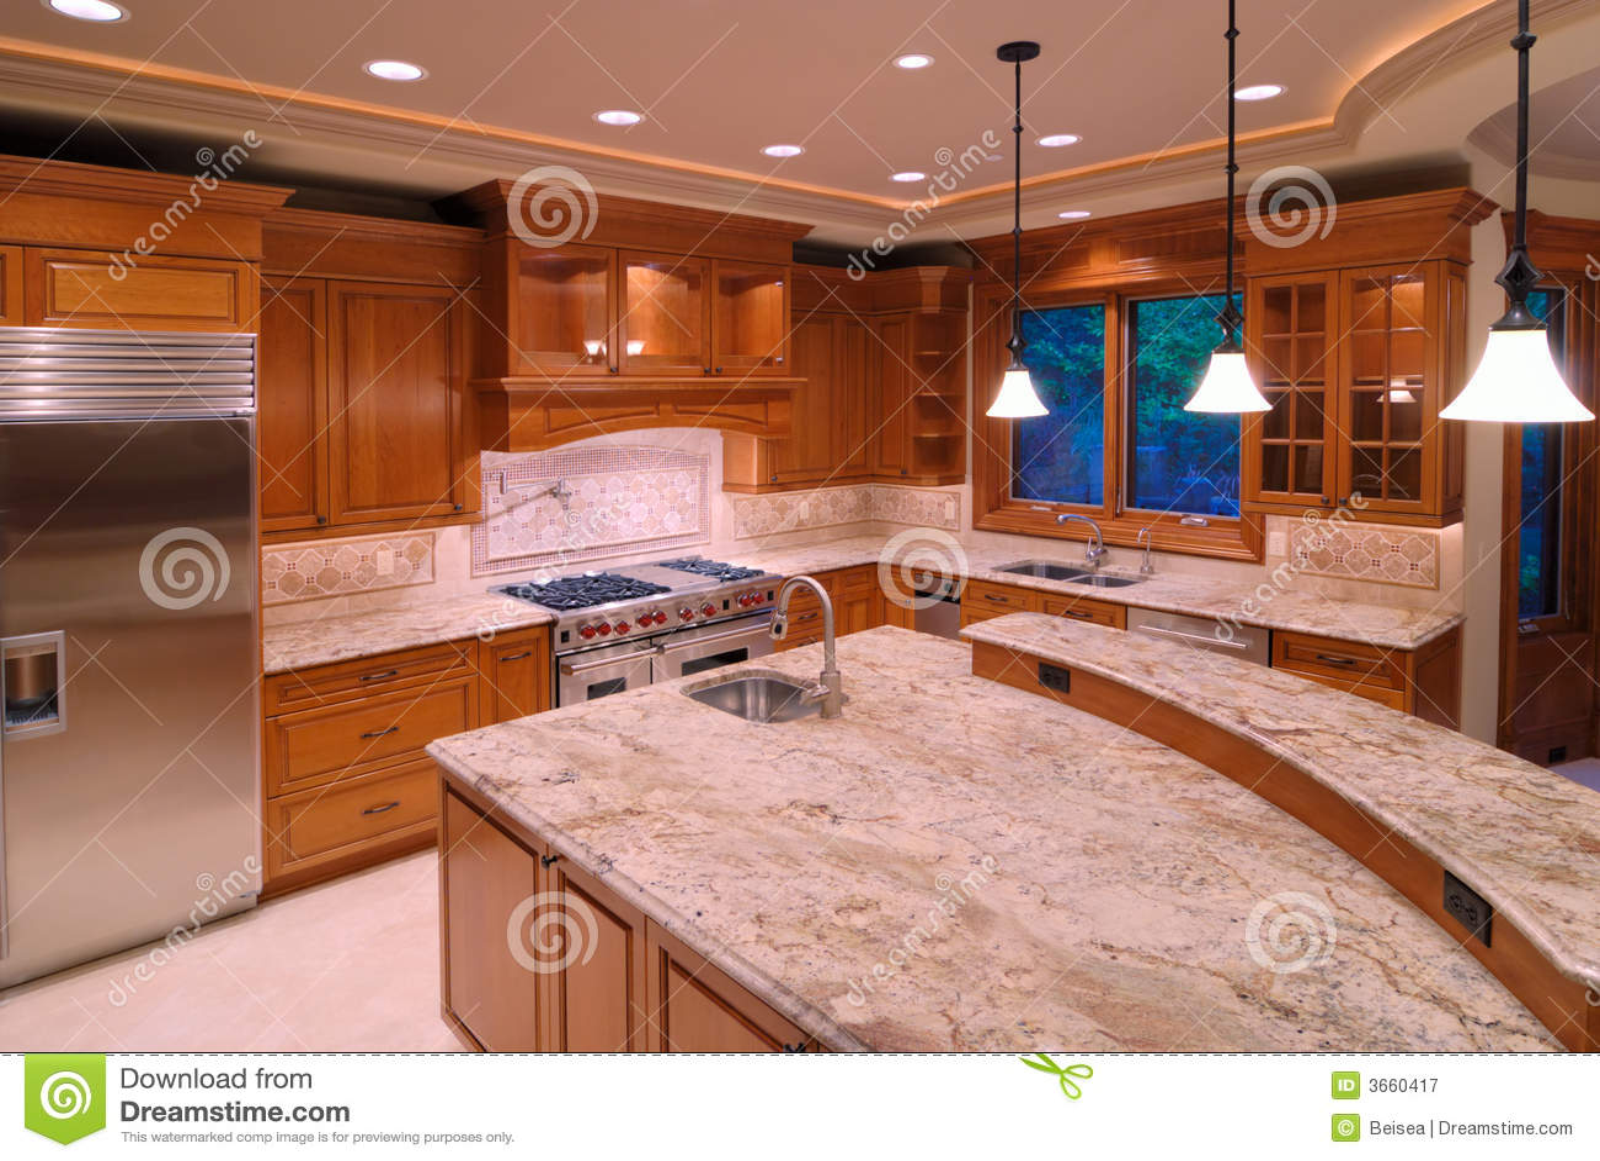 Cucine americane immagine stock immagine di microonda 3660417 - Cuisine de luxe americaine ...